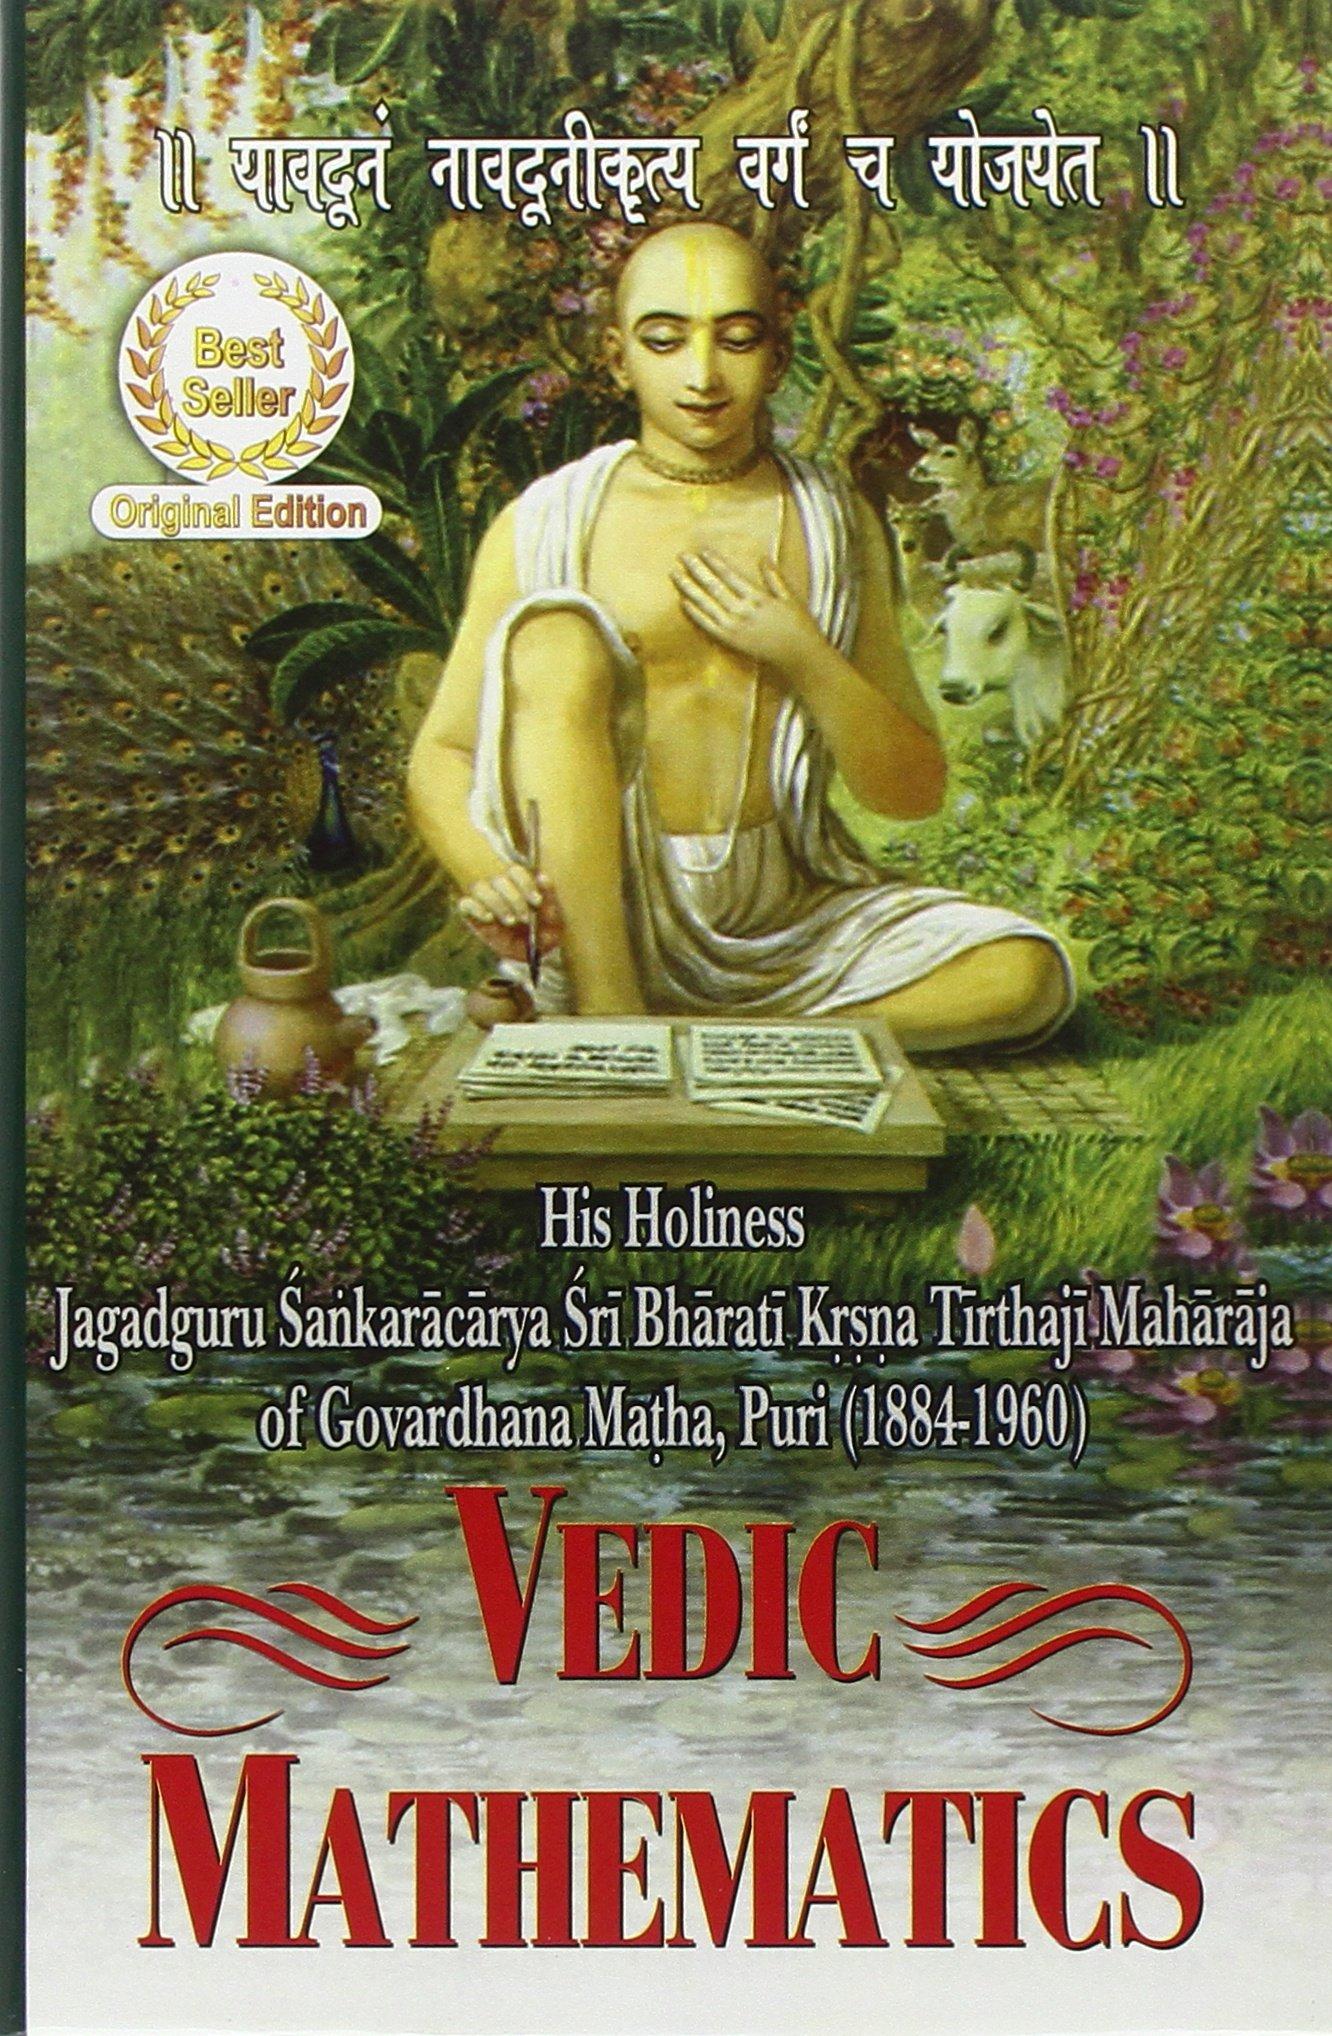 Hindi books vedic in mathematics pdf